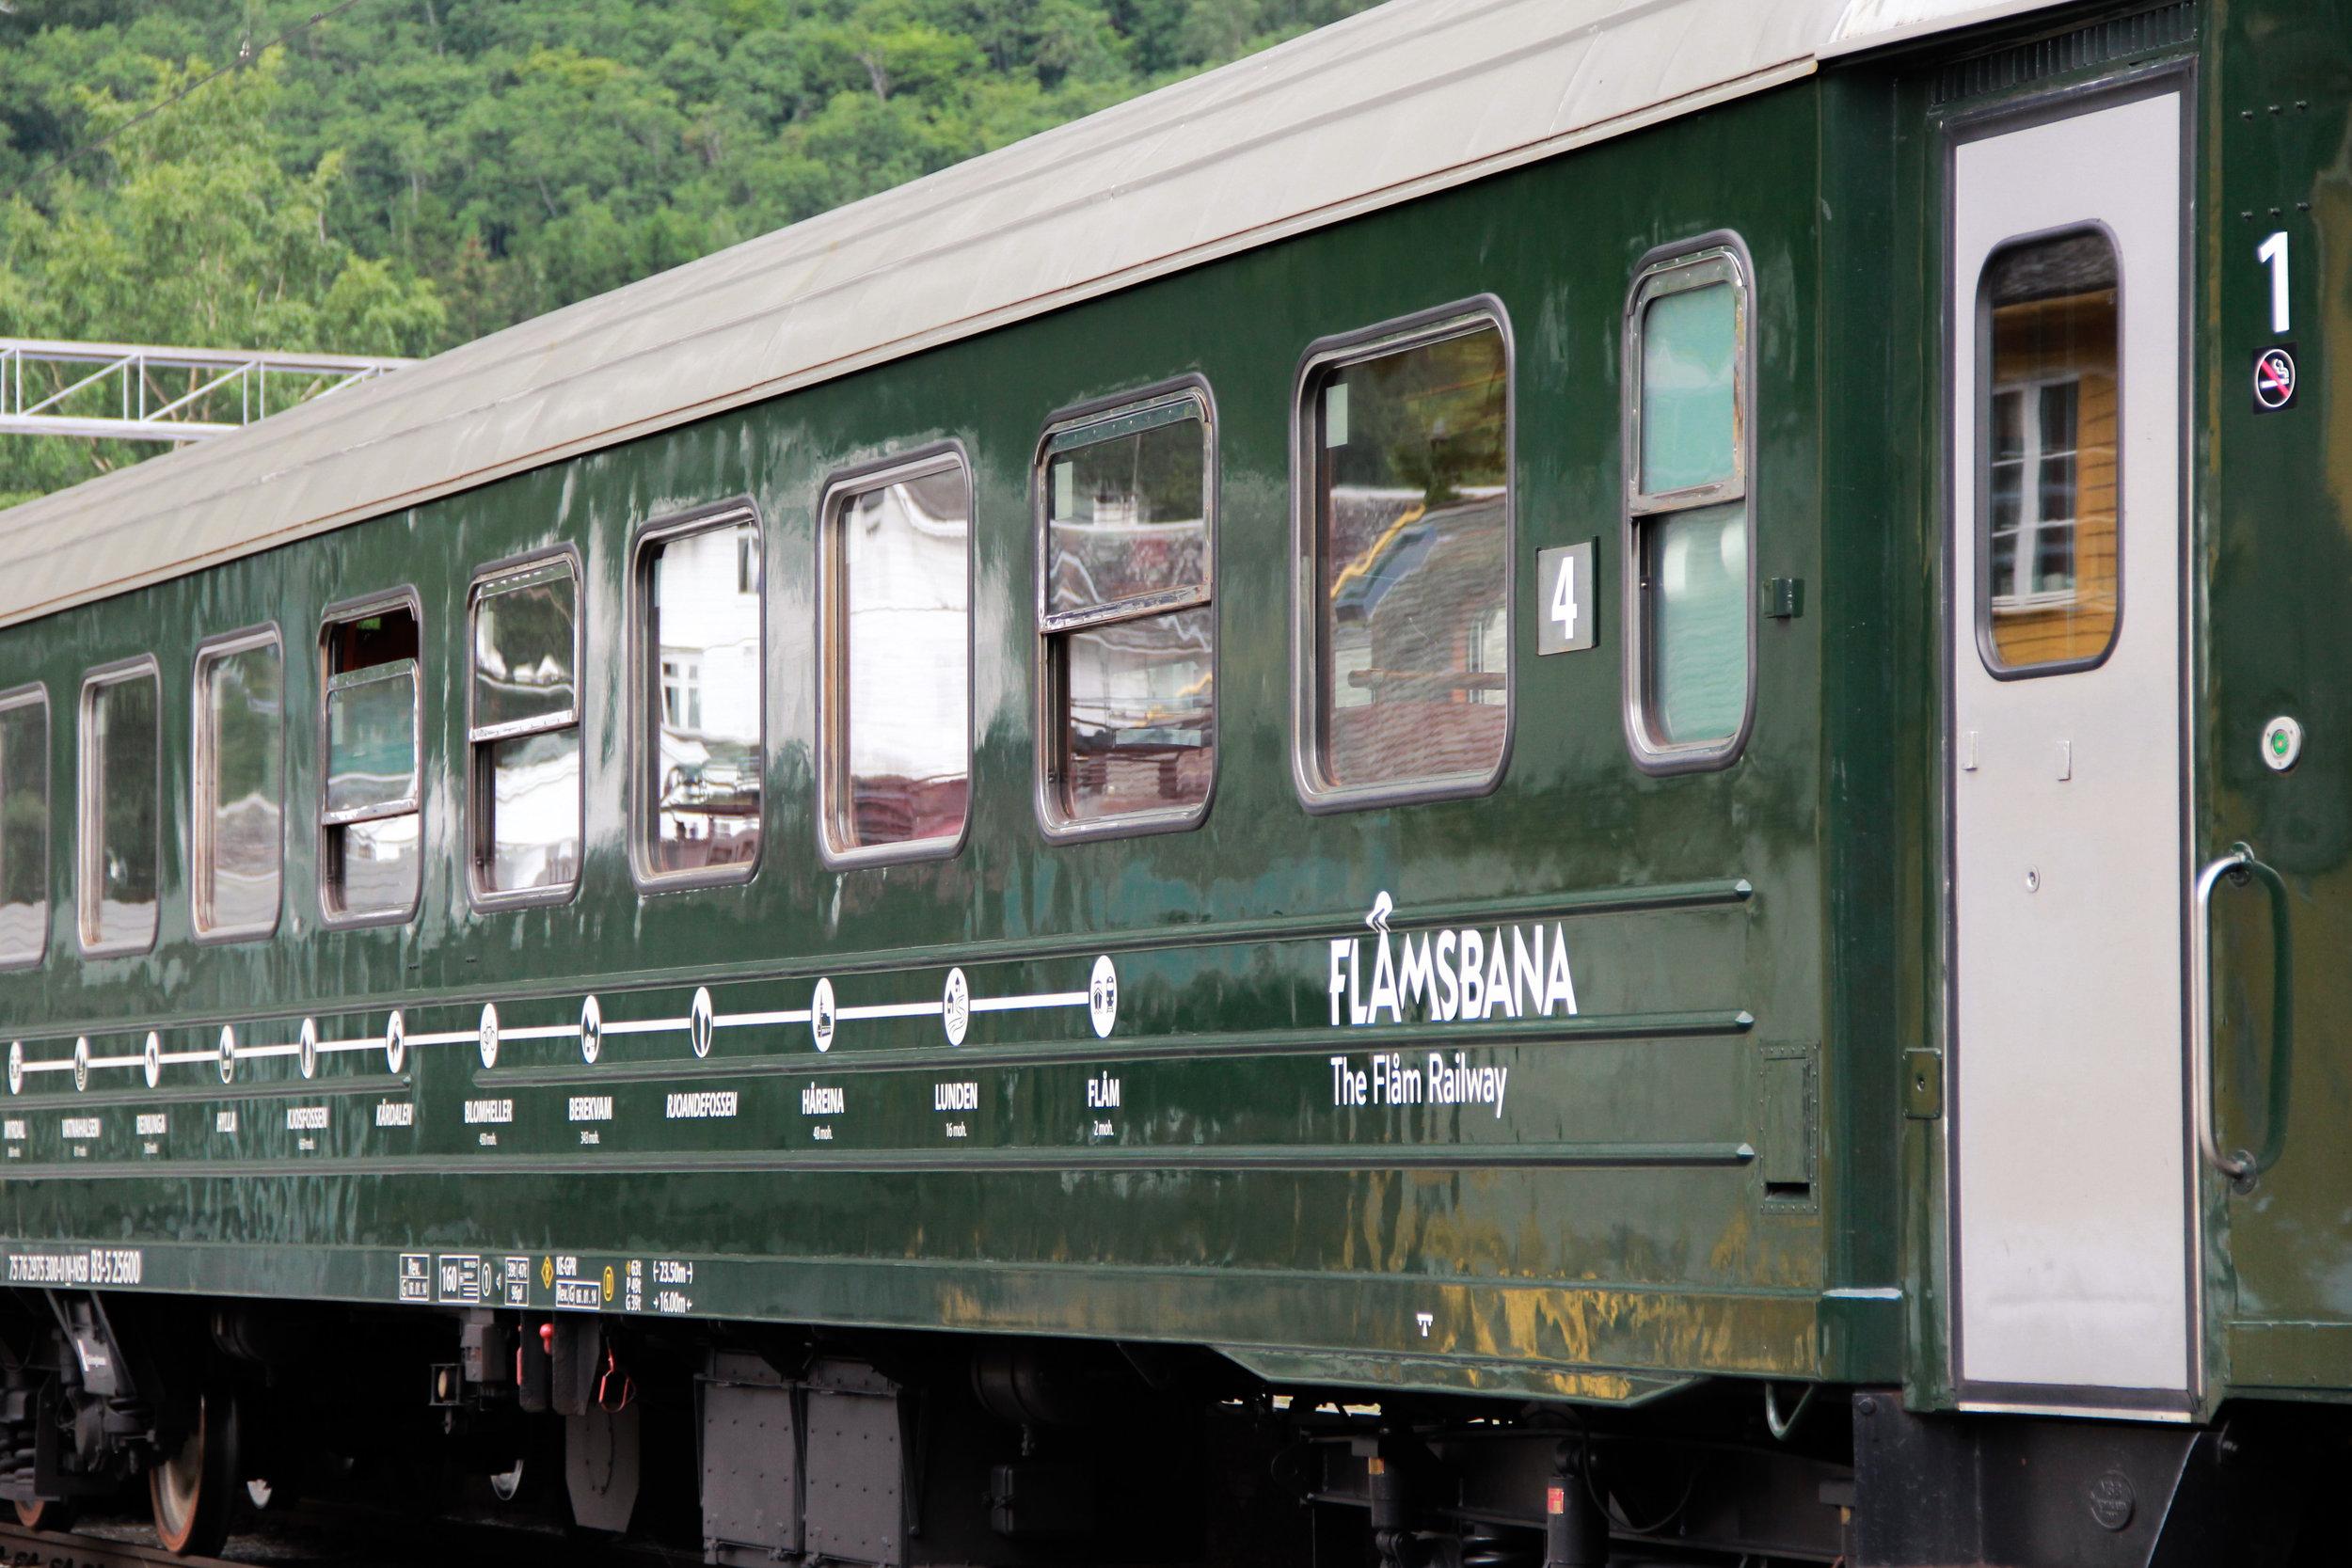 Flamsbrygga Railway line from Myrdal to Flam